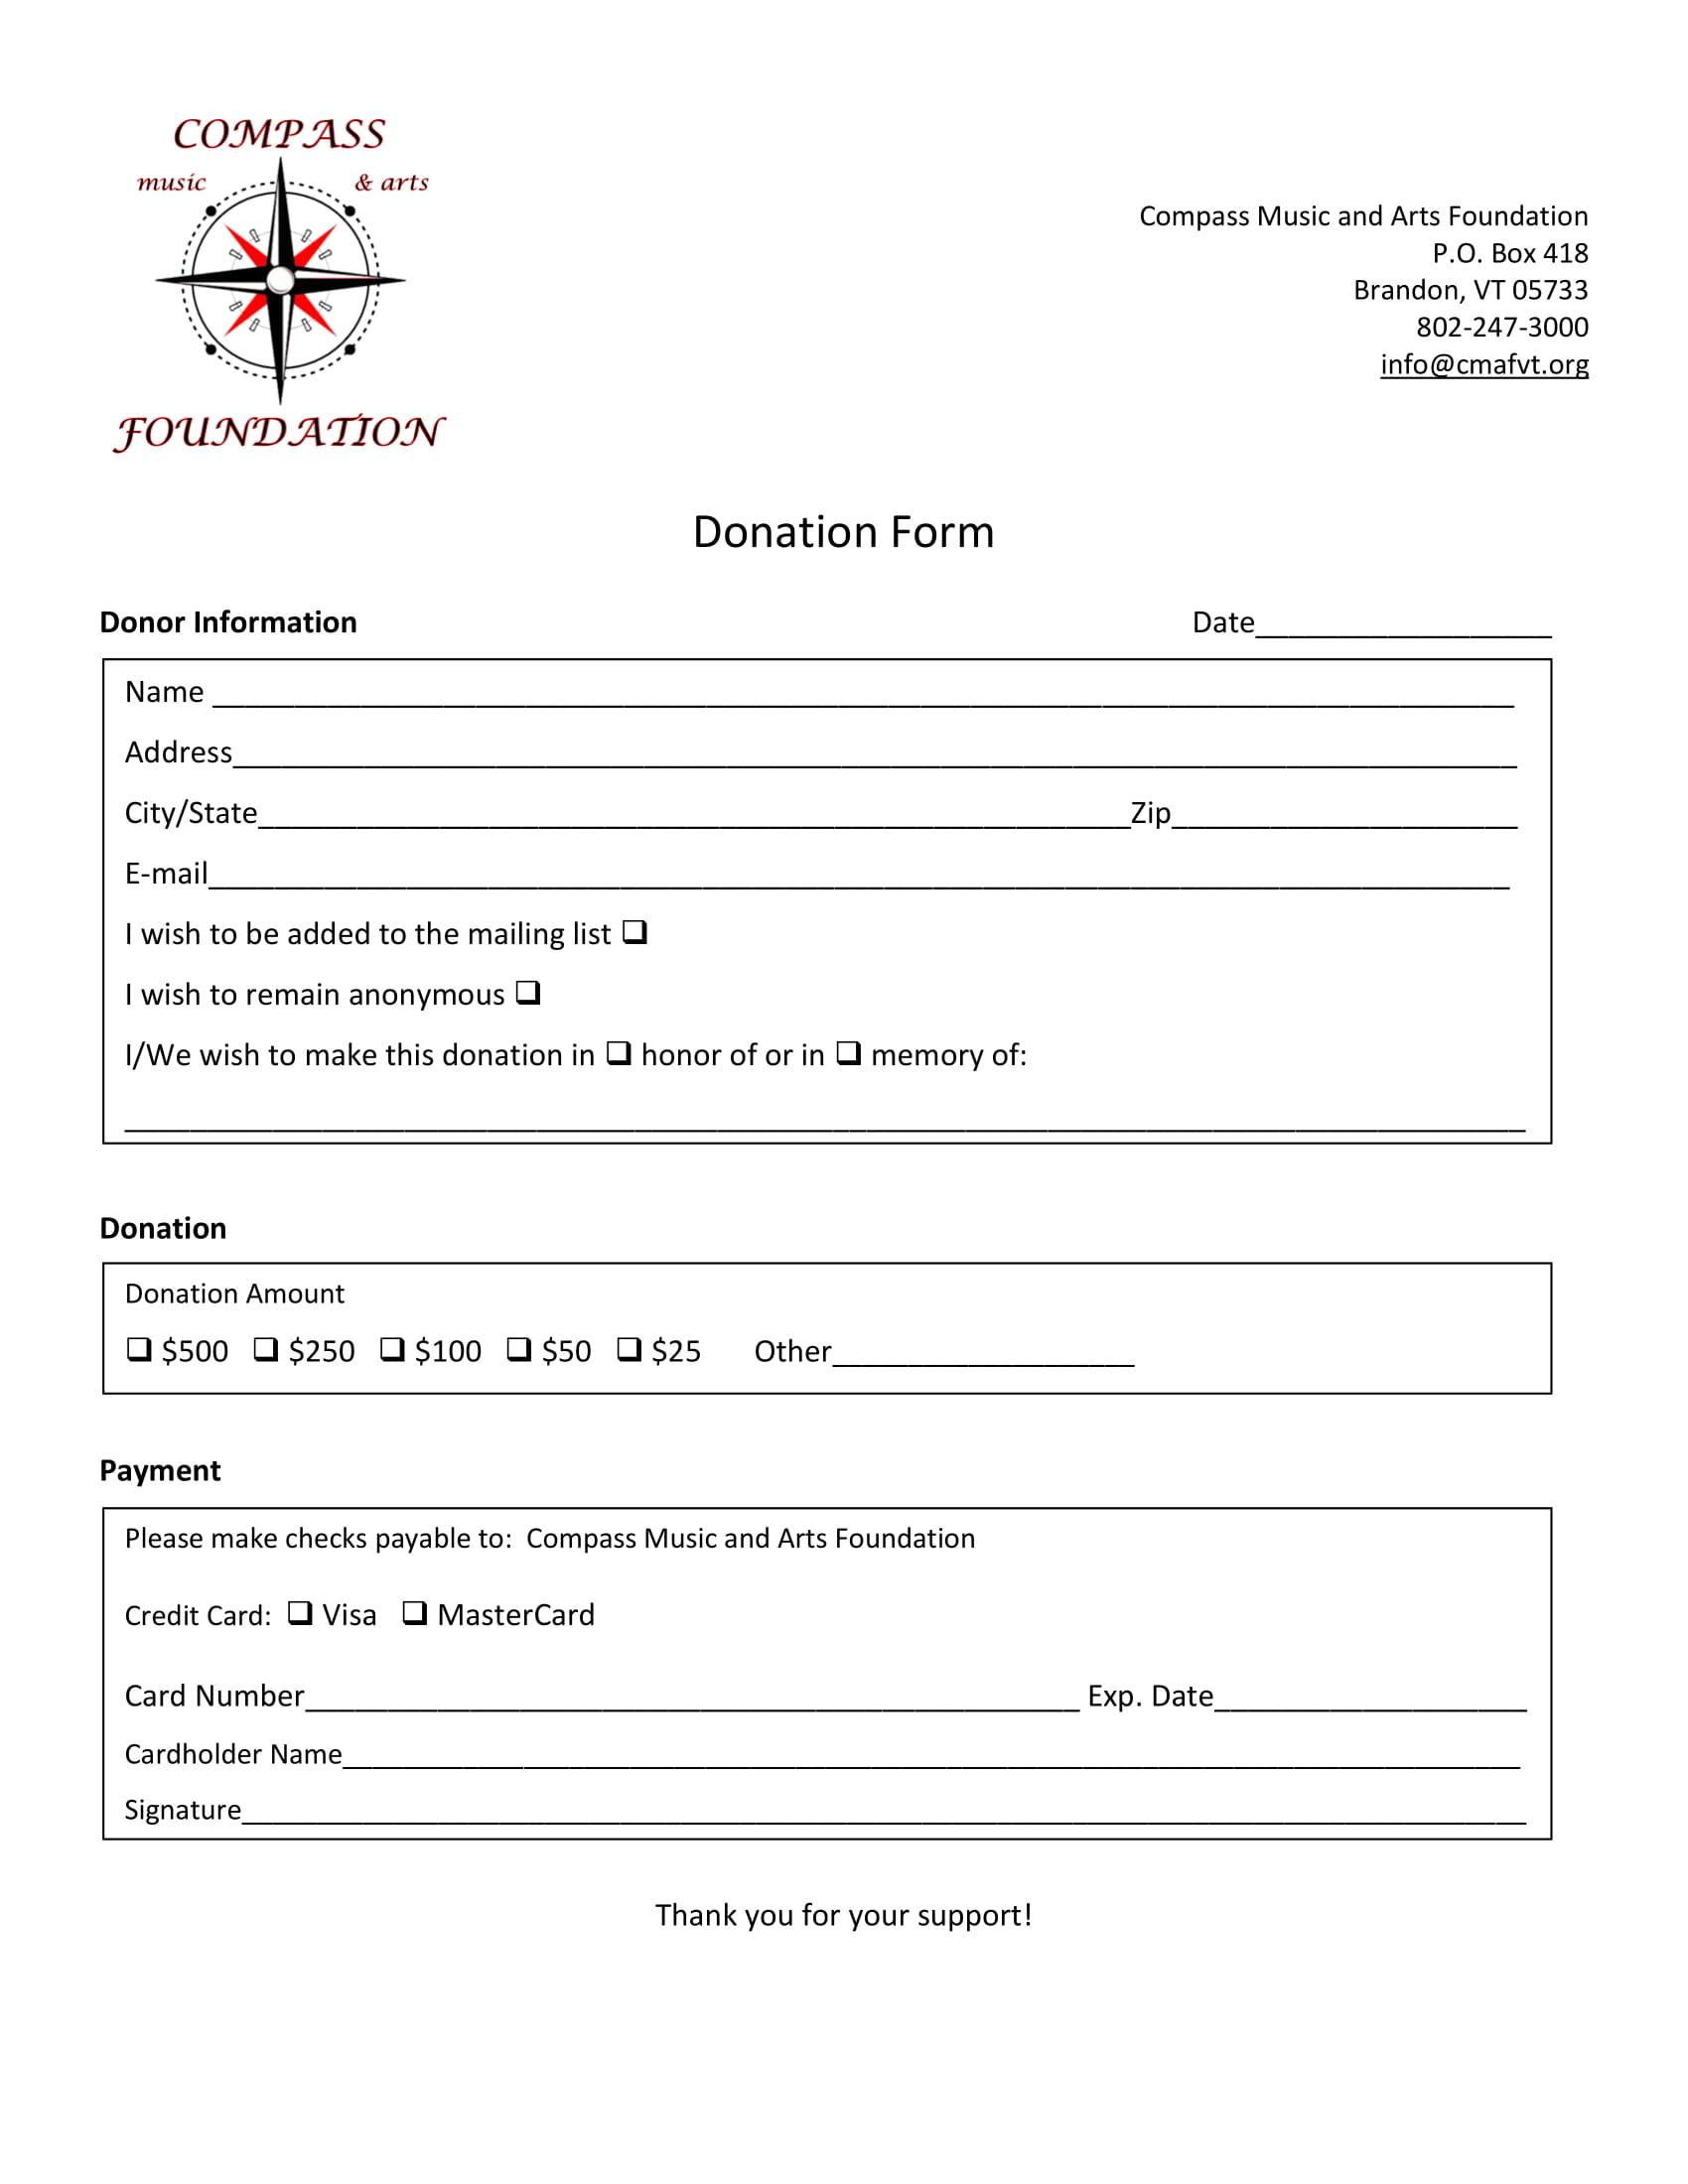 arts foundation donation form 1